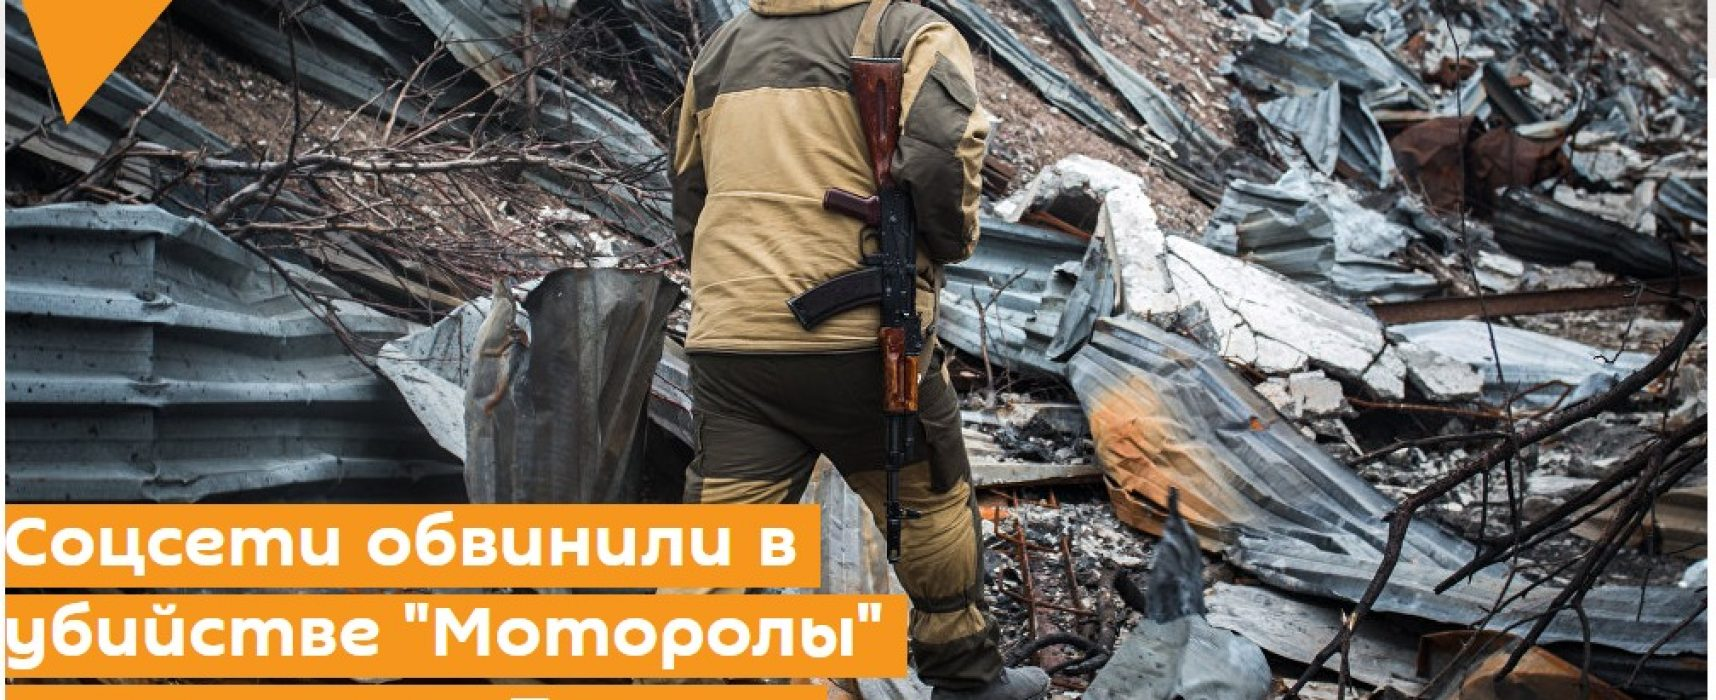 Фейк: «Моторолу» убил латышский наёмник